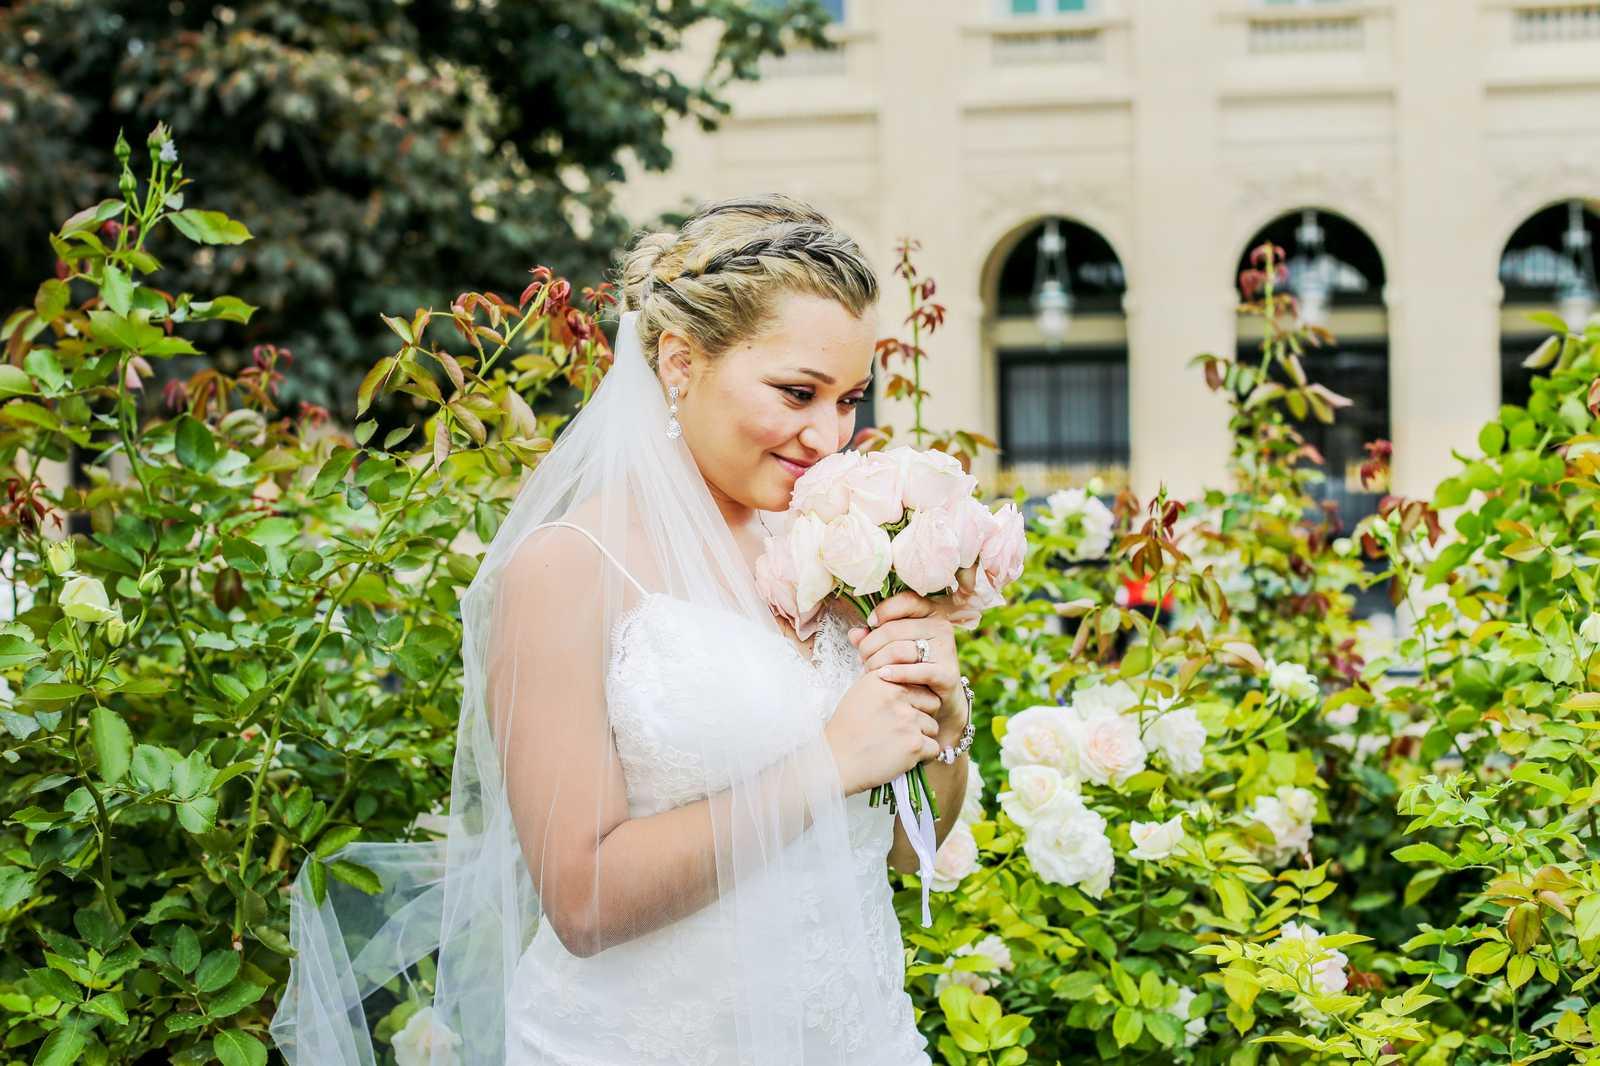 wedding ceremony in paris price